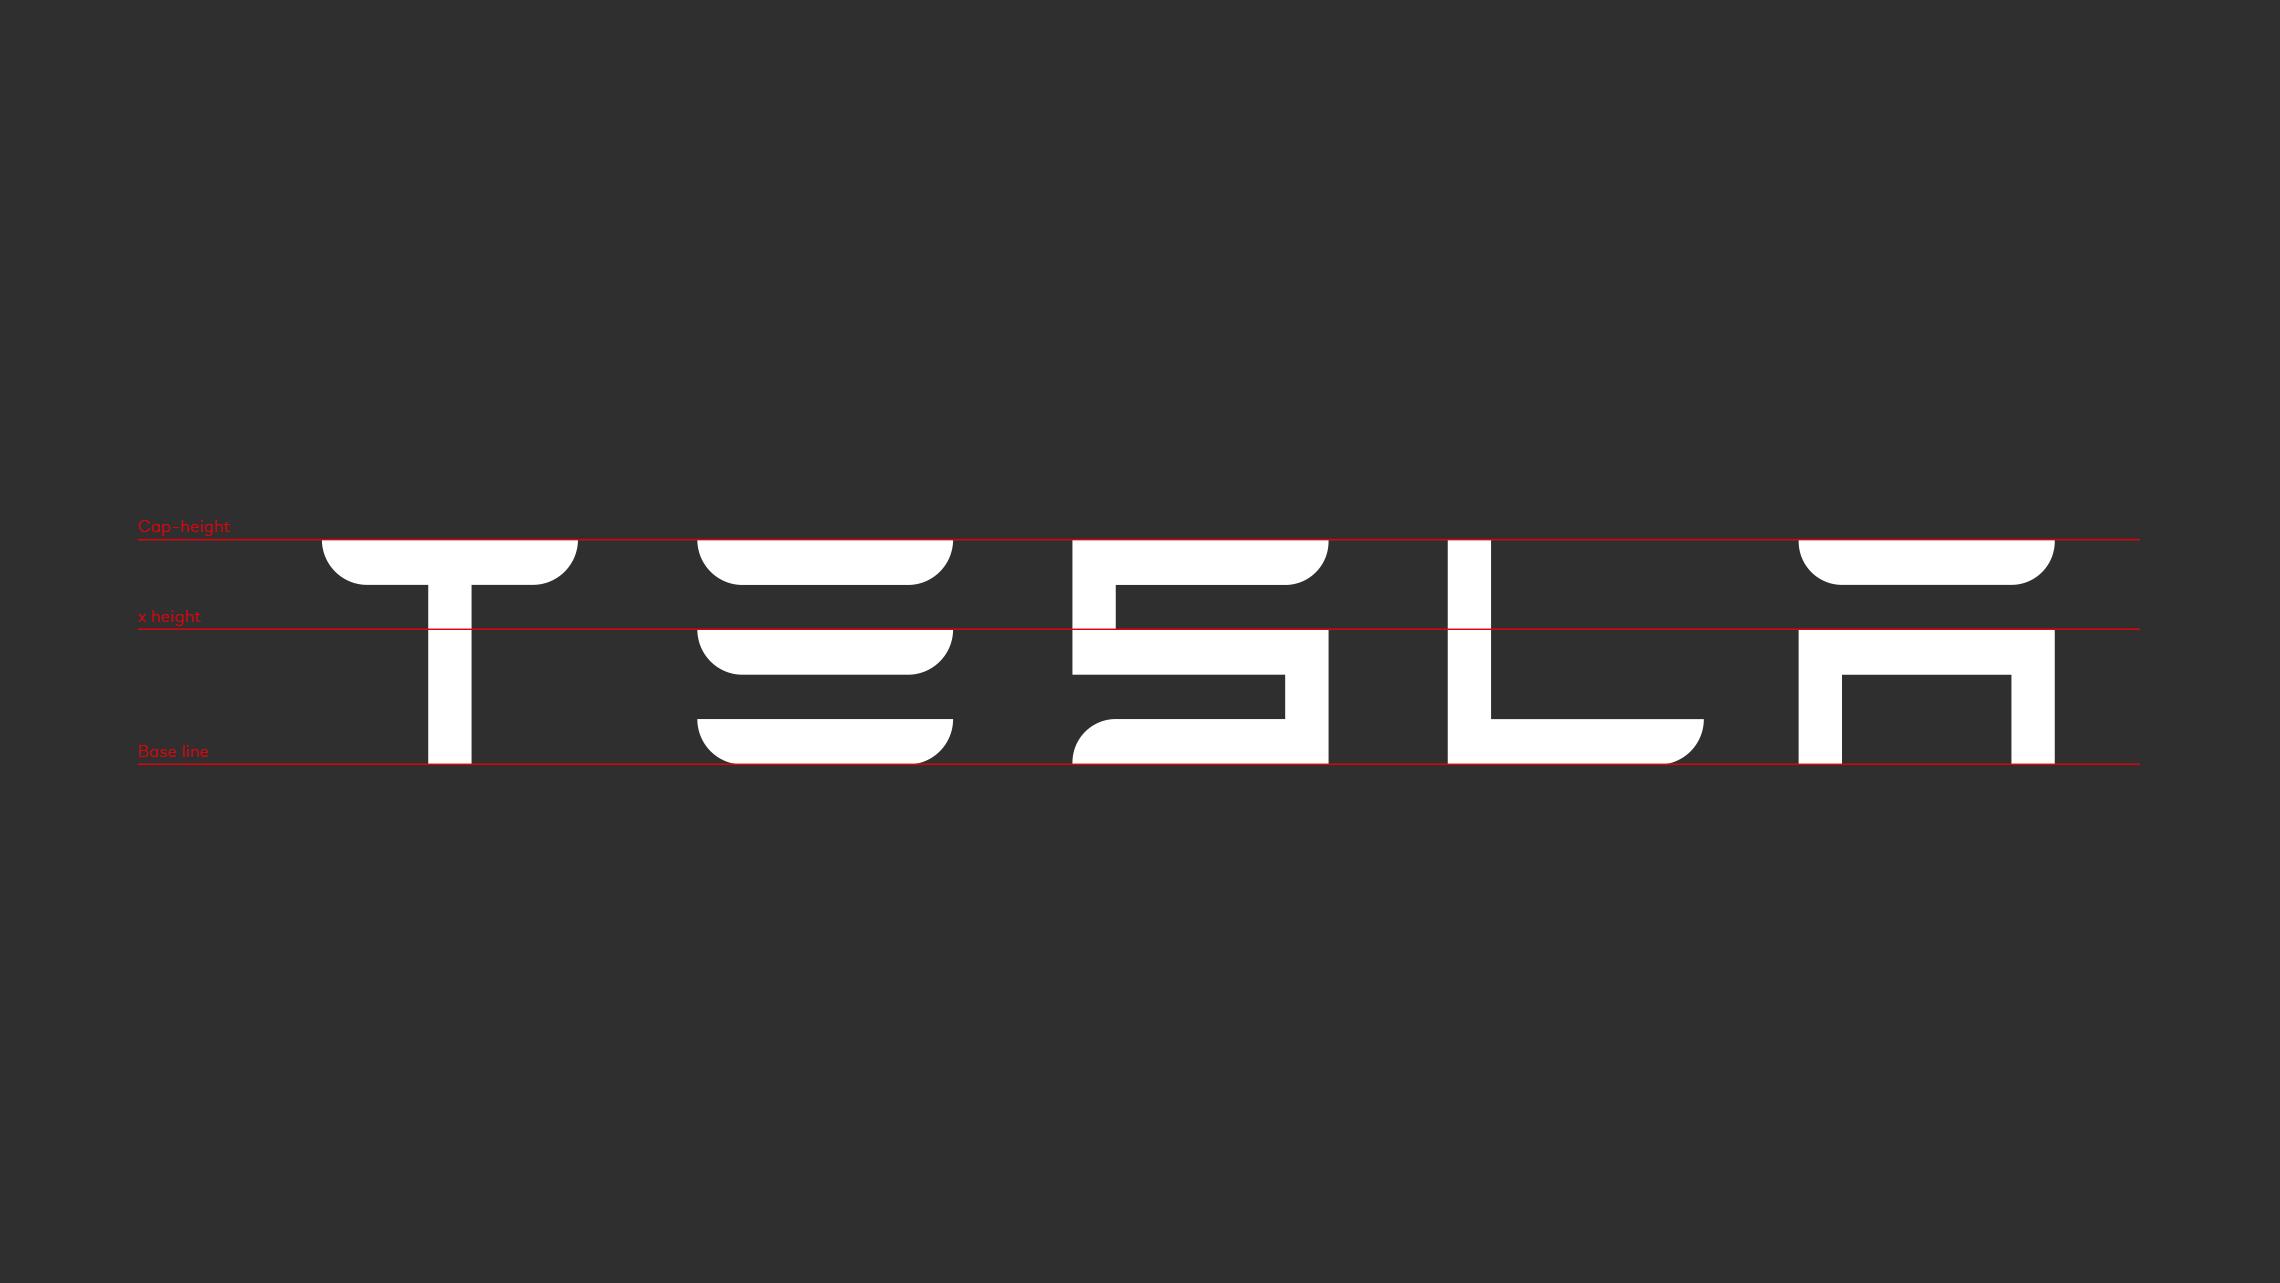 Tesla-Font-1.png